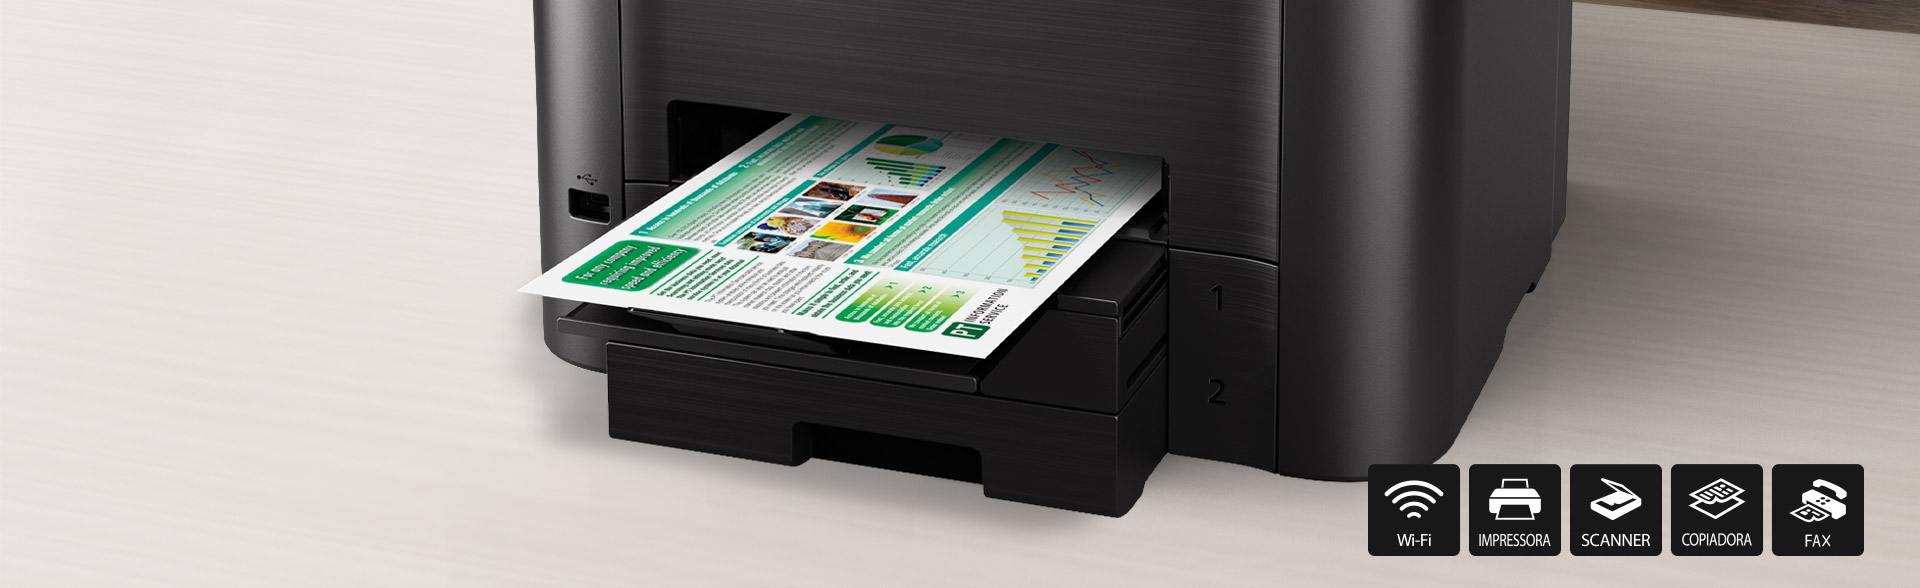 Impressora Multifuncional MAXIFY MB5410